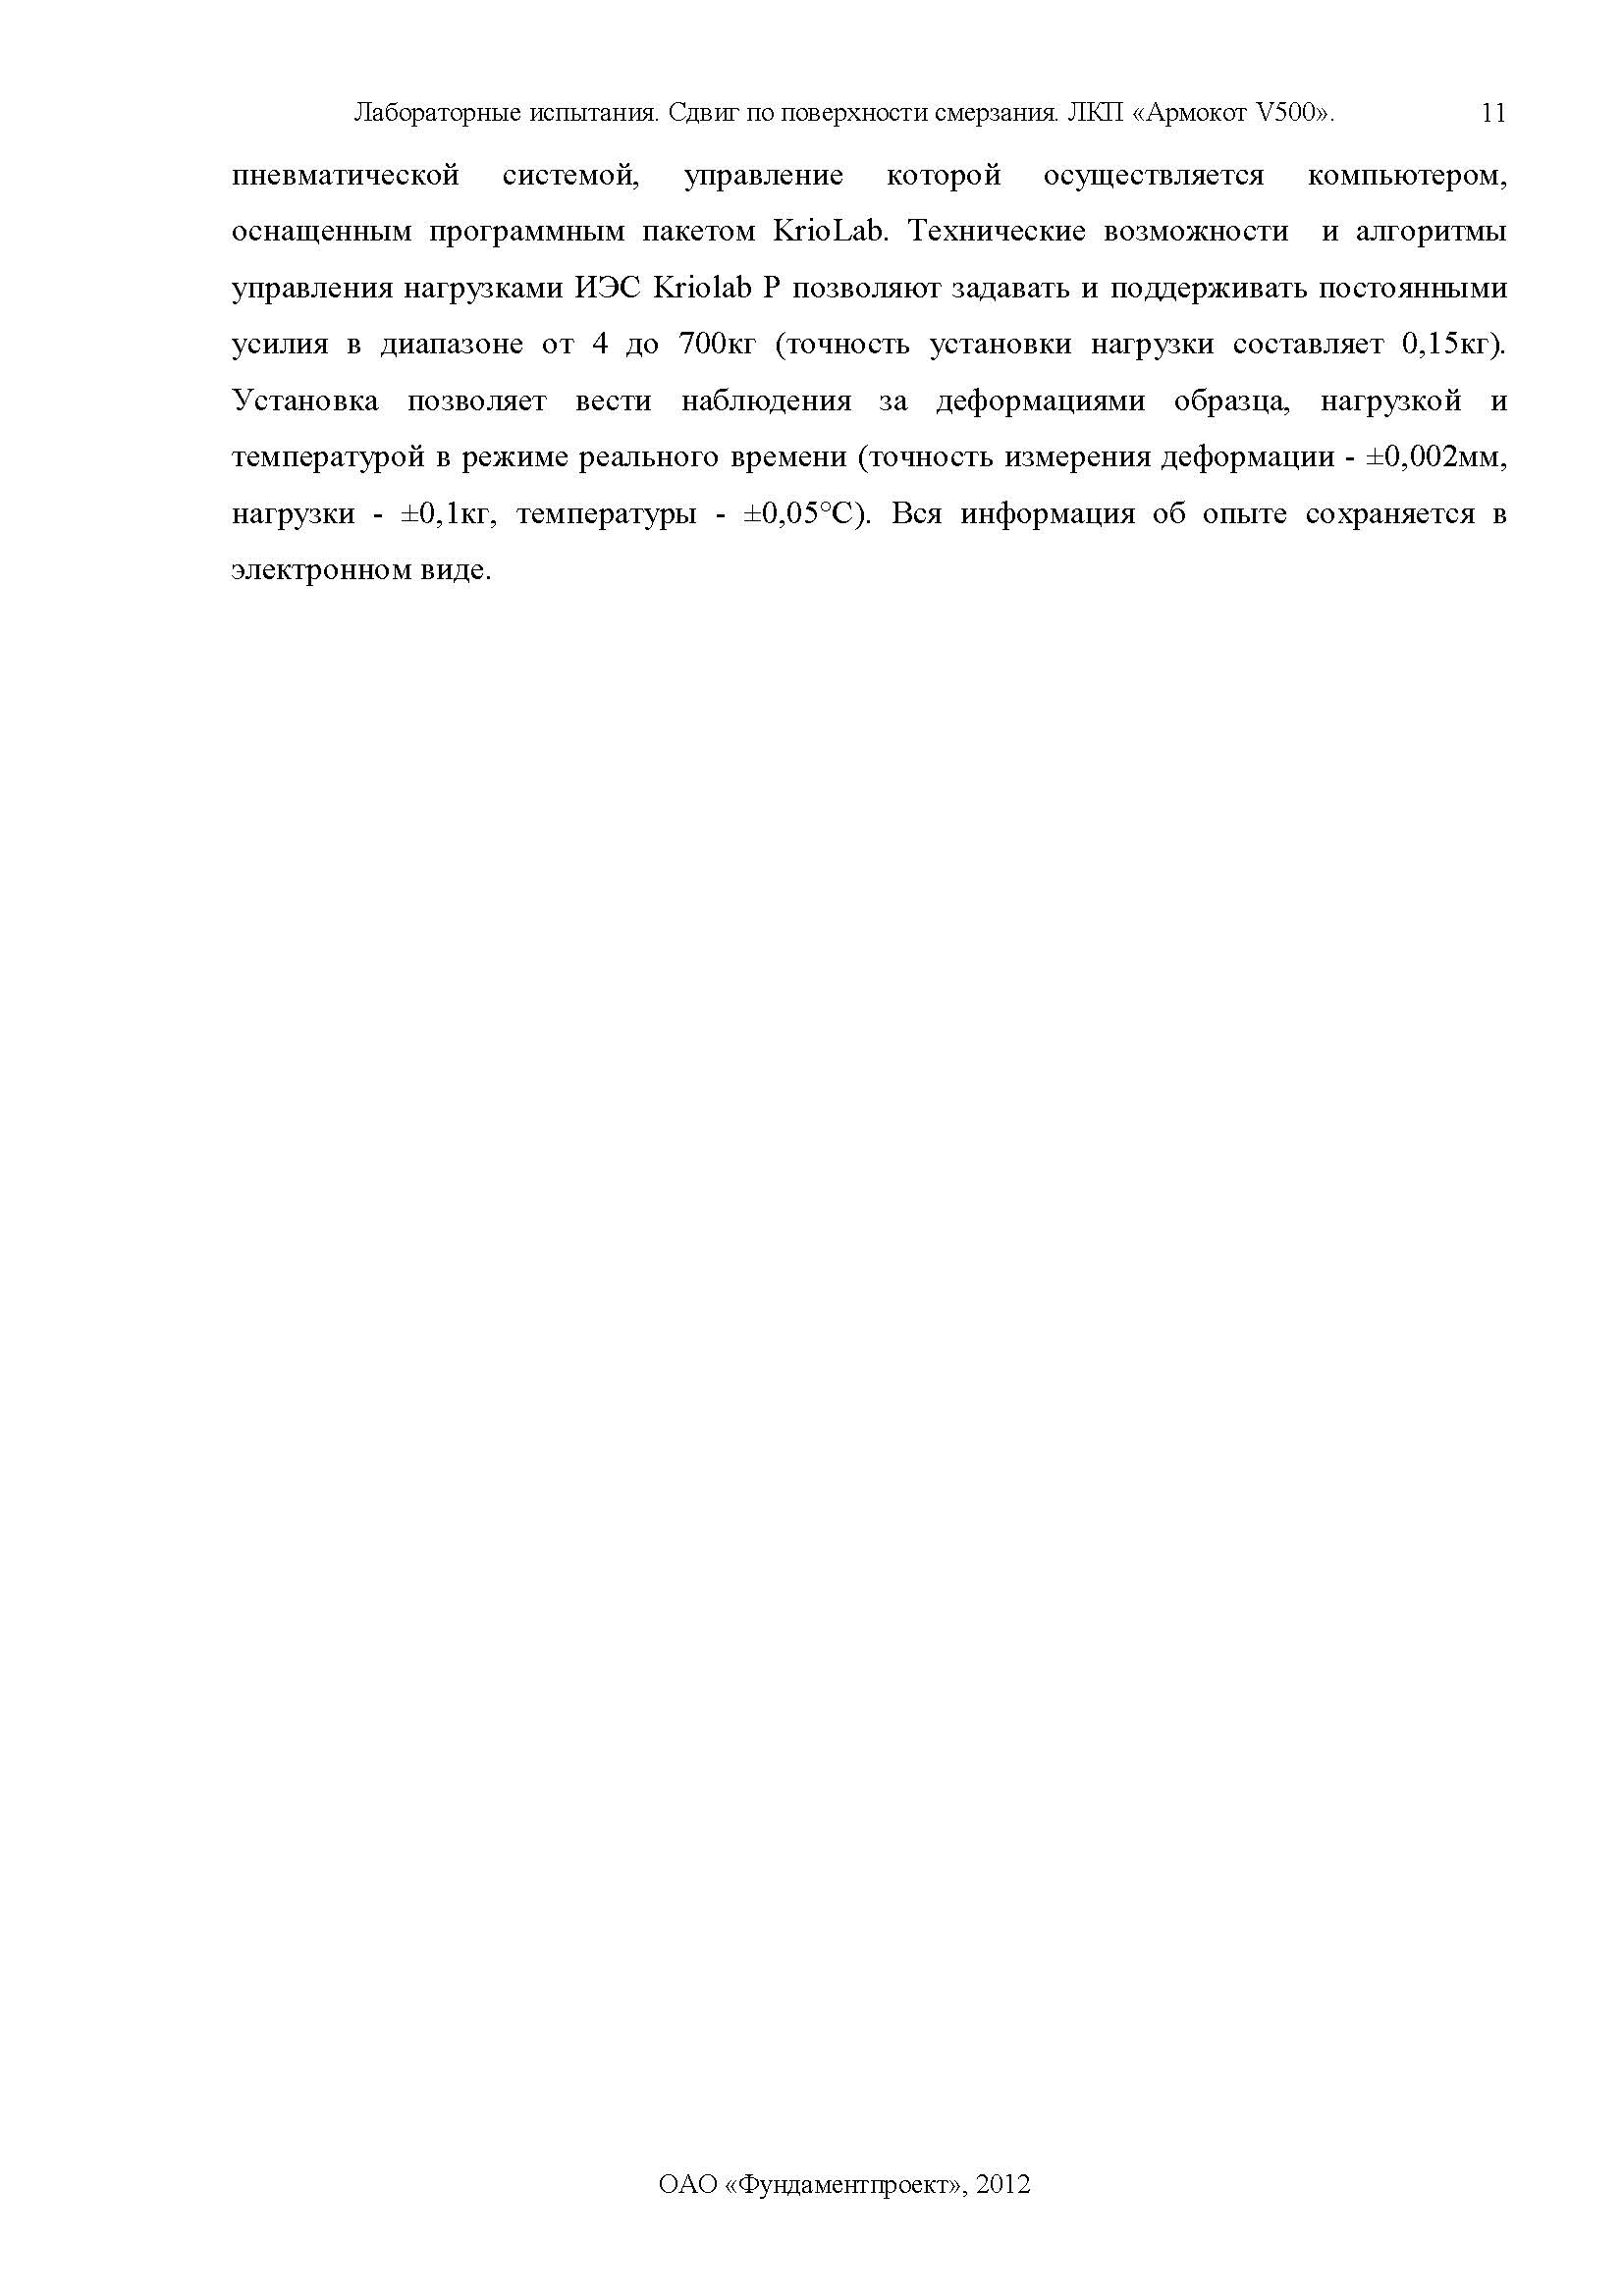 Отчет по сваям Армокот V500 Фундаментпроект_Страница_11